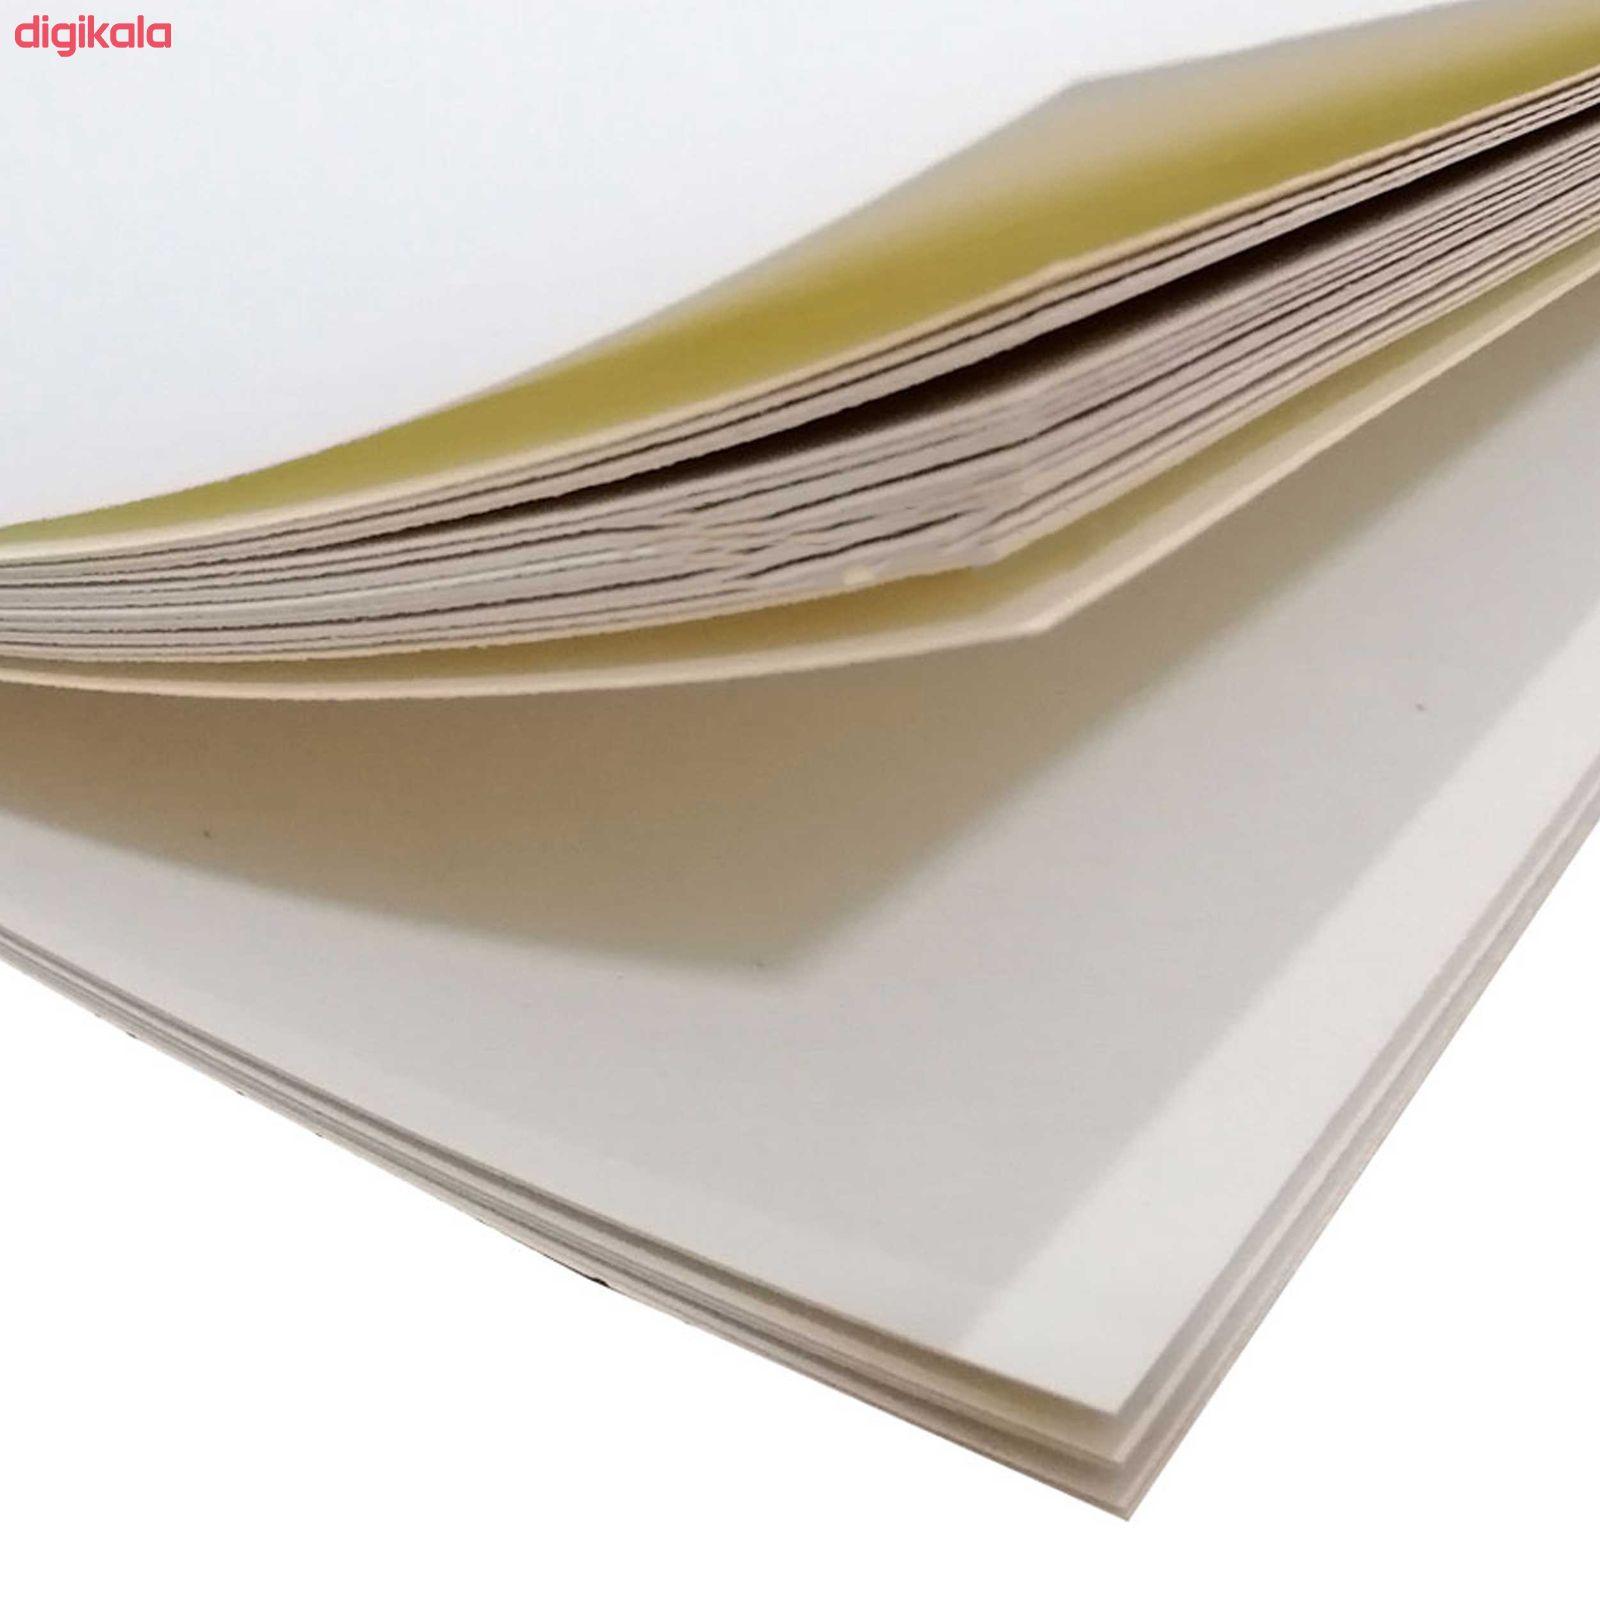 کاغذ طراحی A3 پارس کد 3042_75GR بسته 50 عددی  main 1 3